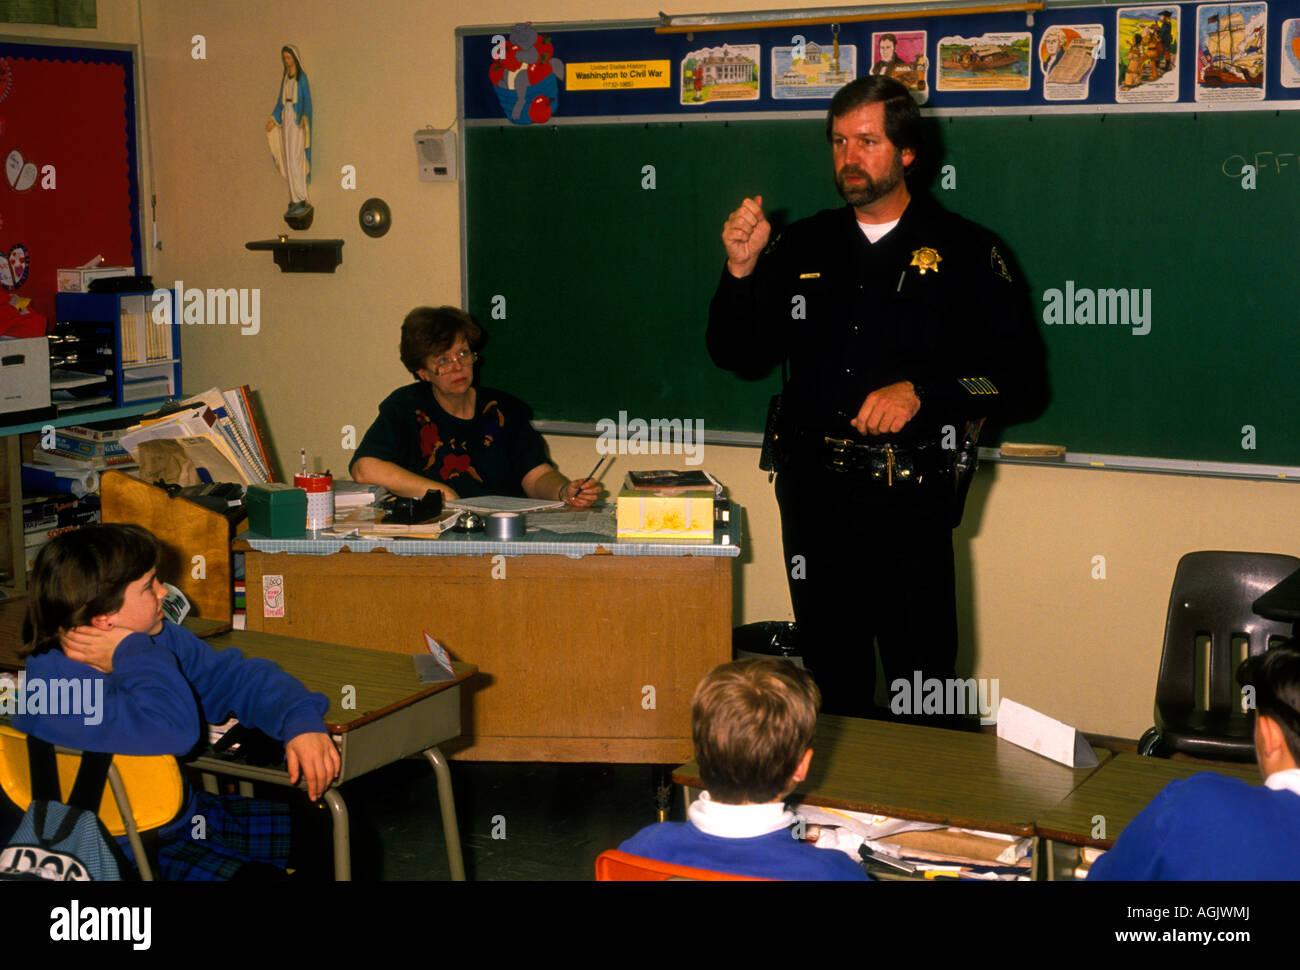 police officer, talking to children, DARE, drug awareness resistance education, drug awareness, Novato, California - Stock Image